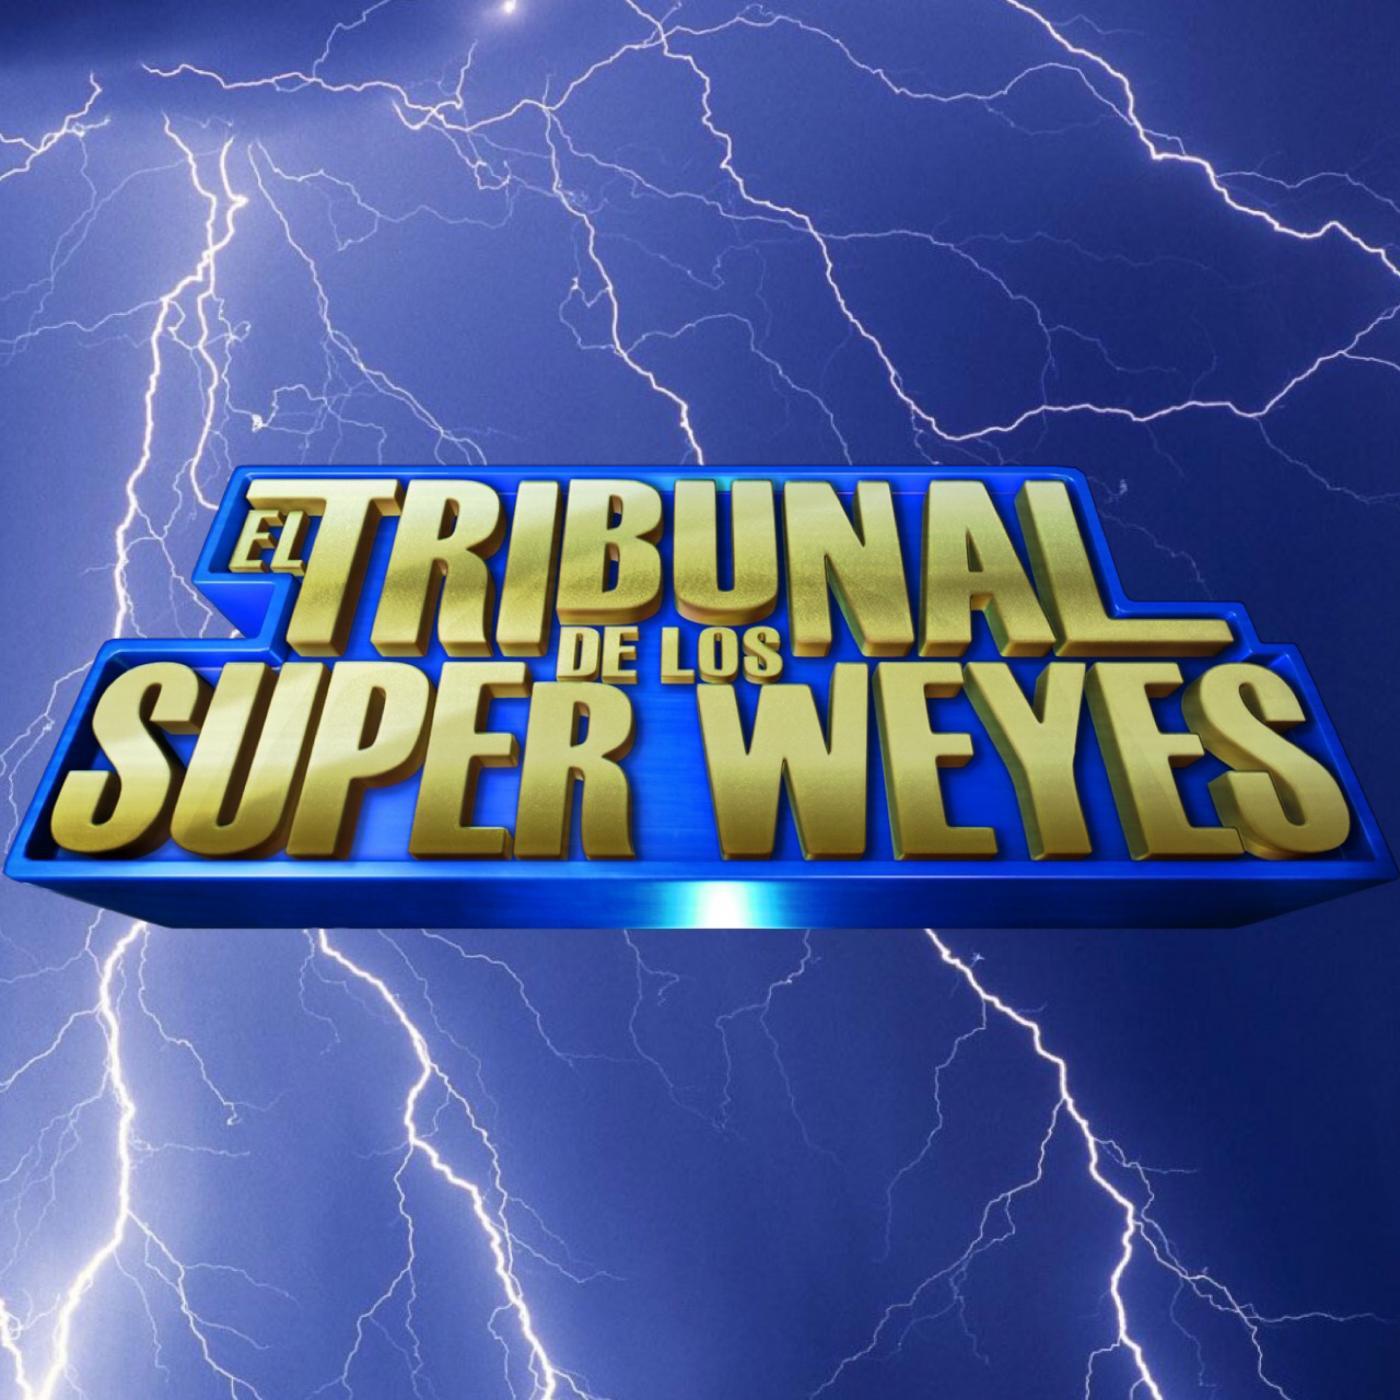 Tribunal de los Superweyes